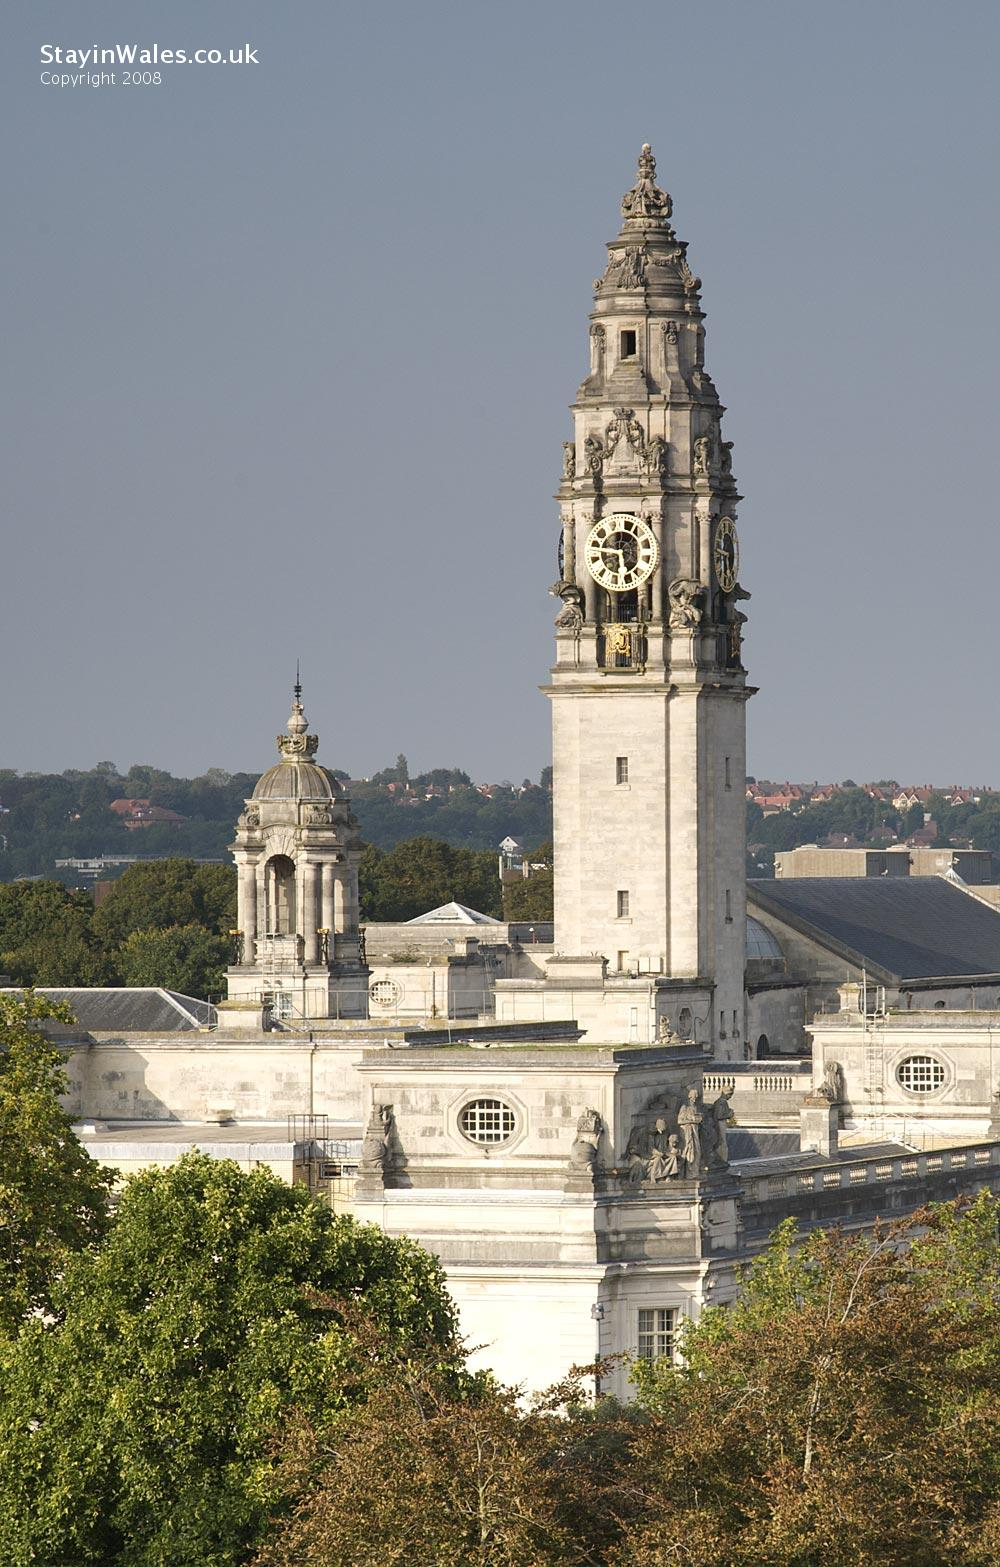 City Hall clocktower, Cardiff